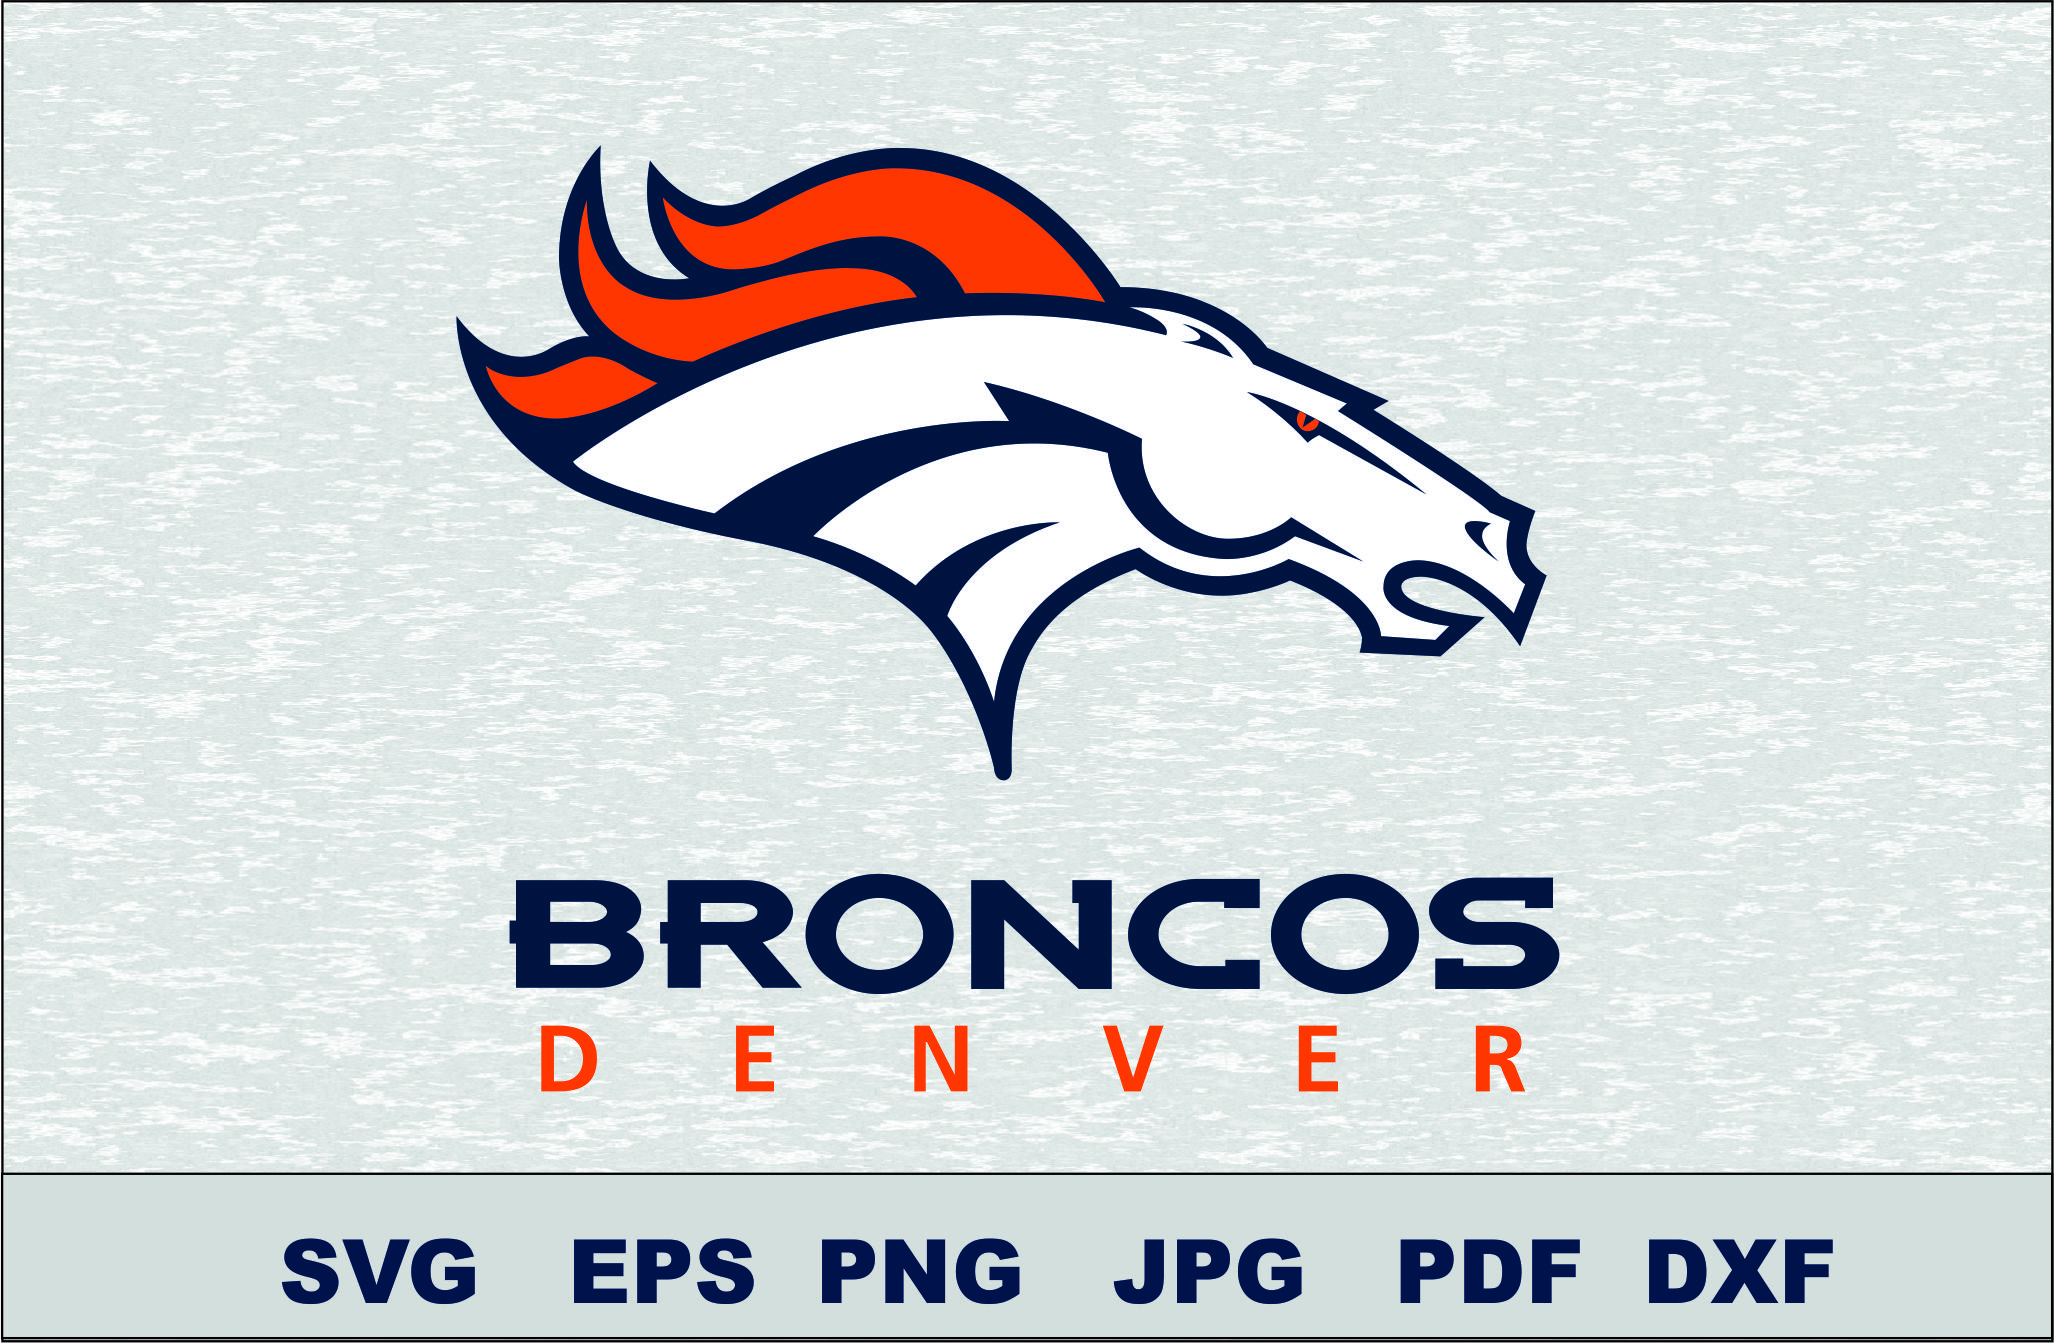 Denver Broncos SVG DXF Logo Silhouette Studio Transfer Iron on Cut File  Cameo Cricut Iron on decal Vinyl decal Layered Vector.